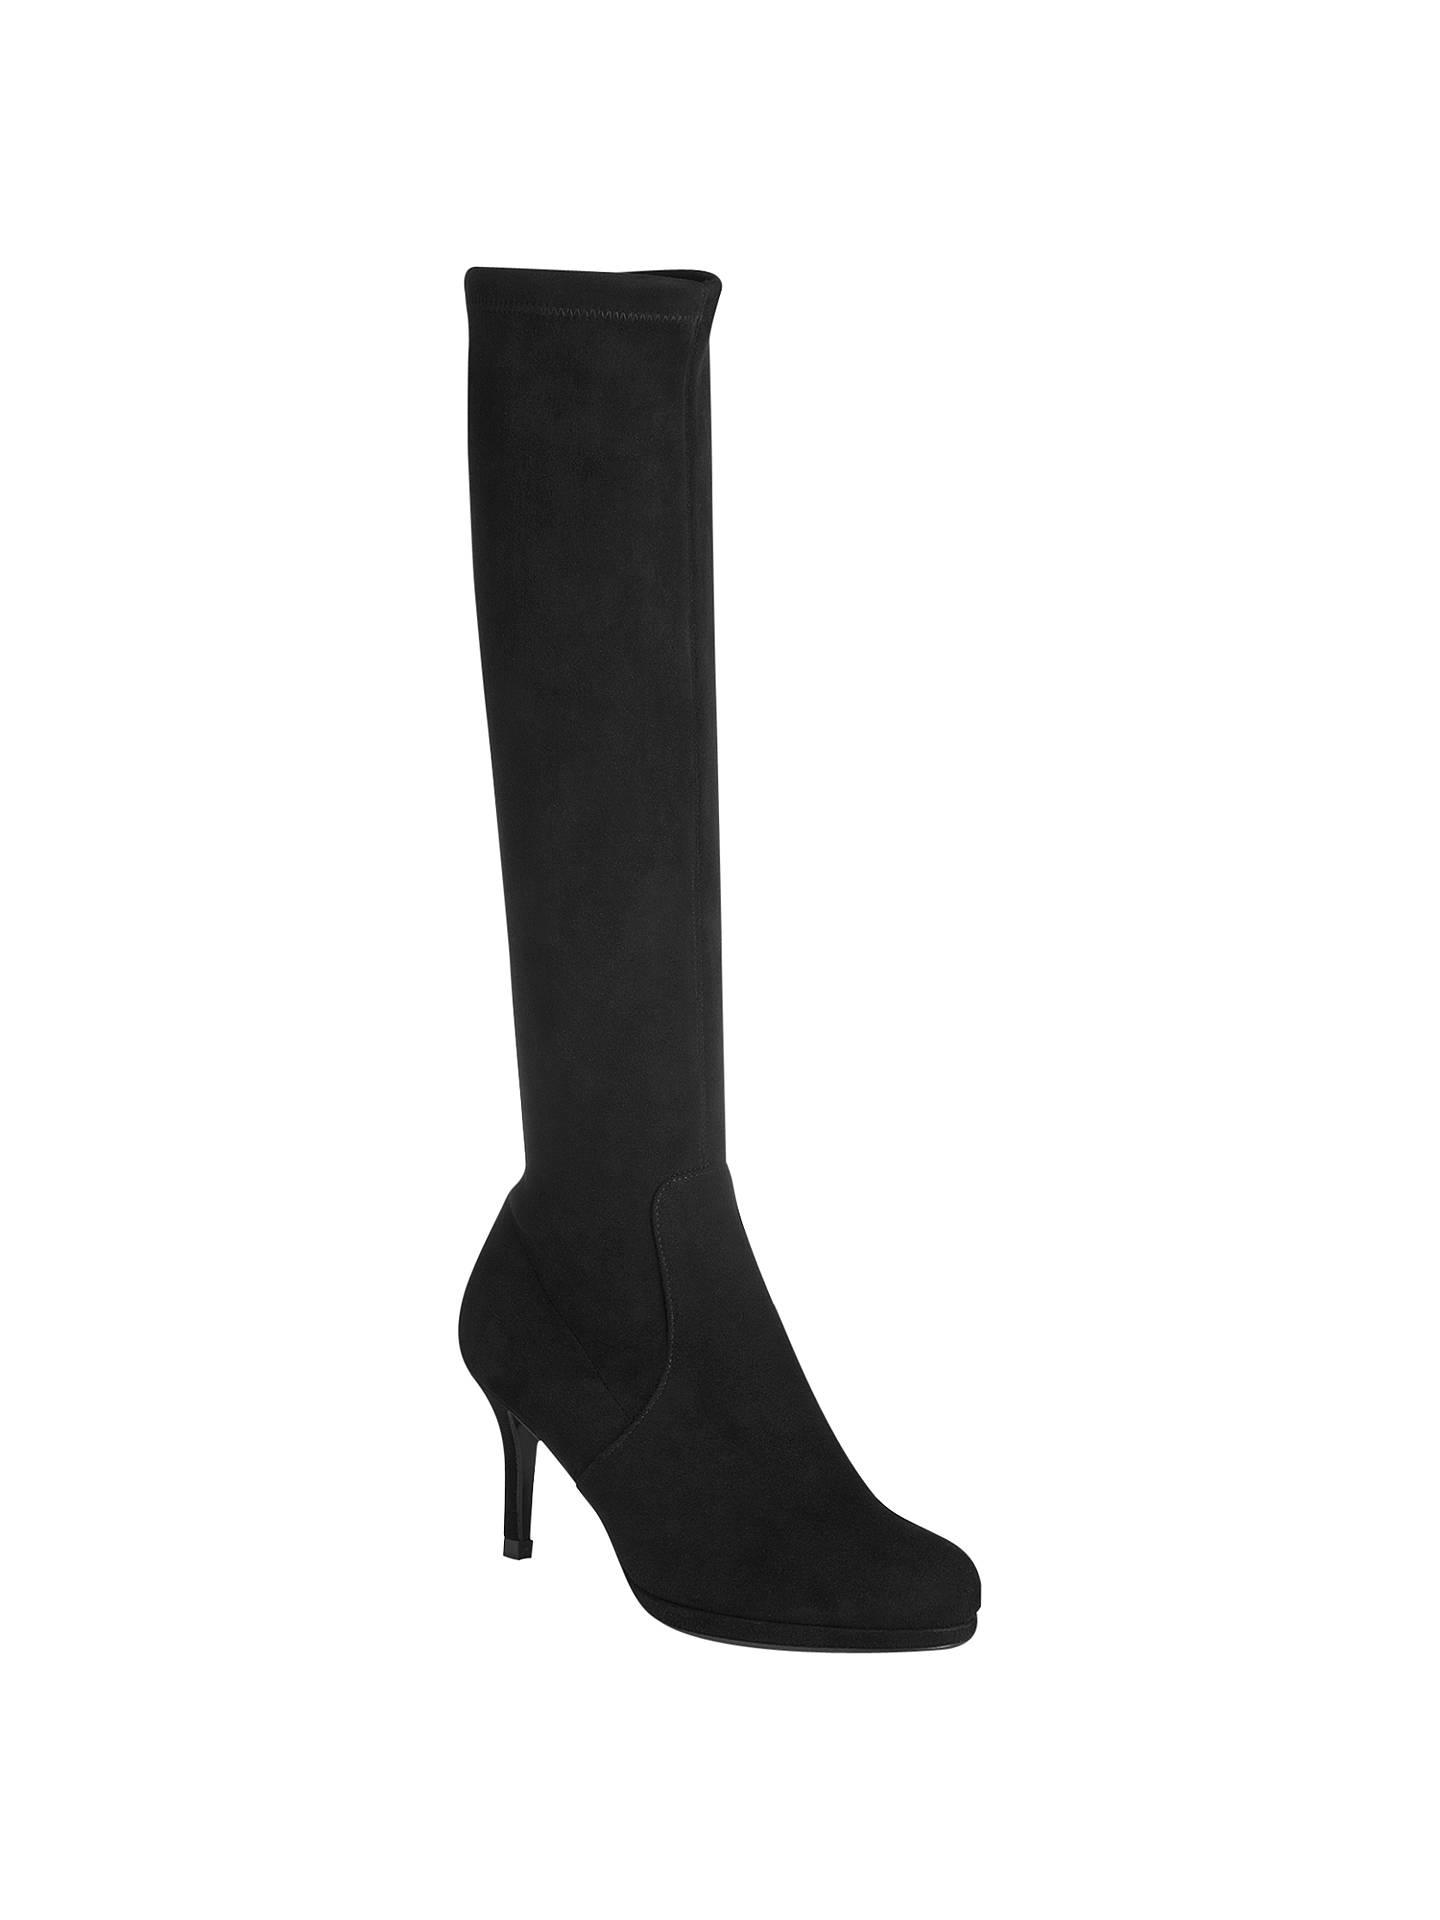 481215df1 Buy L.K. Bennett Sylvie Knee High Boots, Black, 3 Online at johnlewis.com  ...